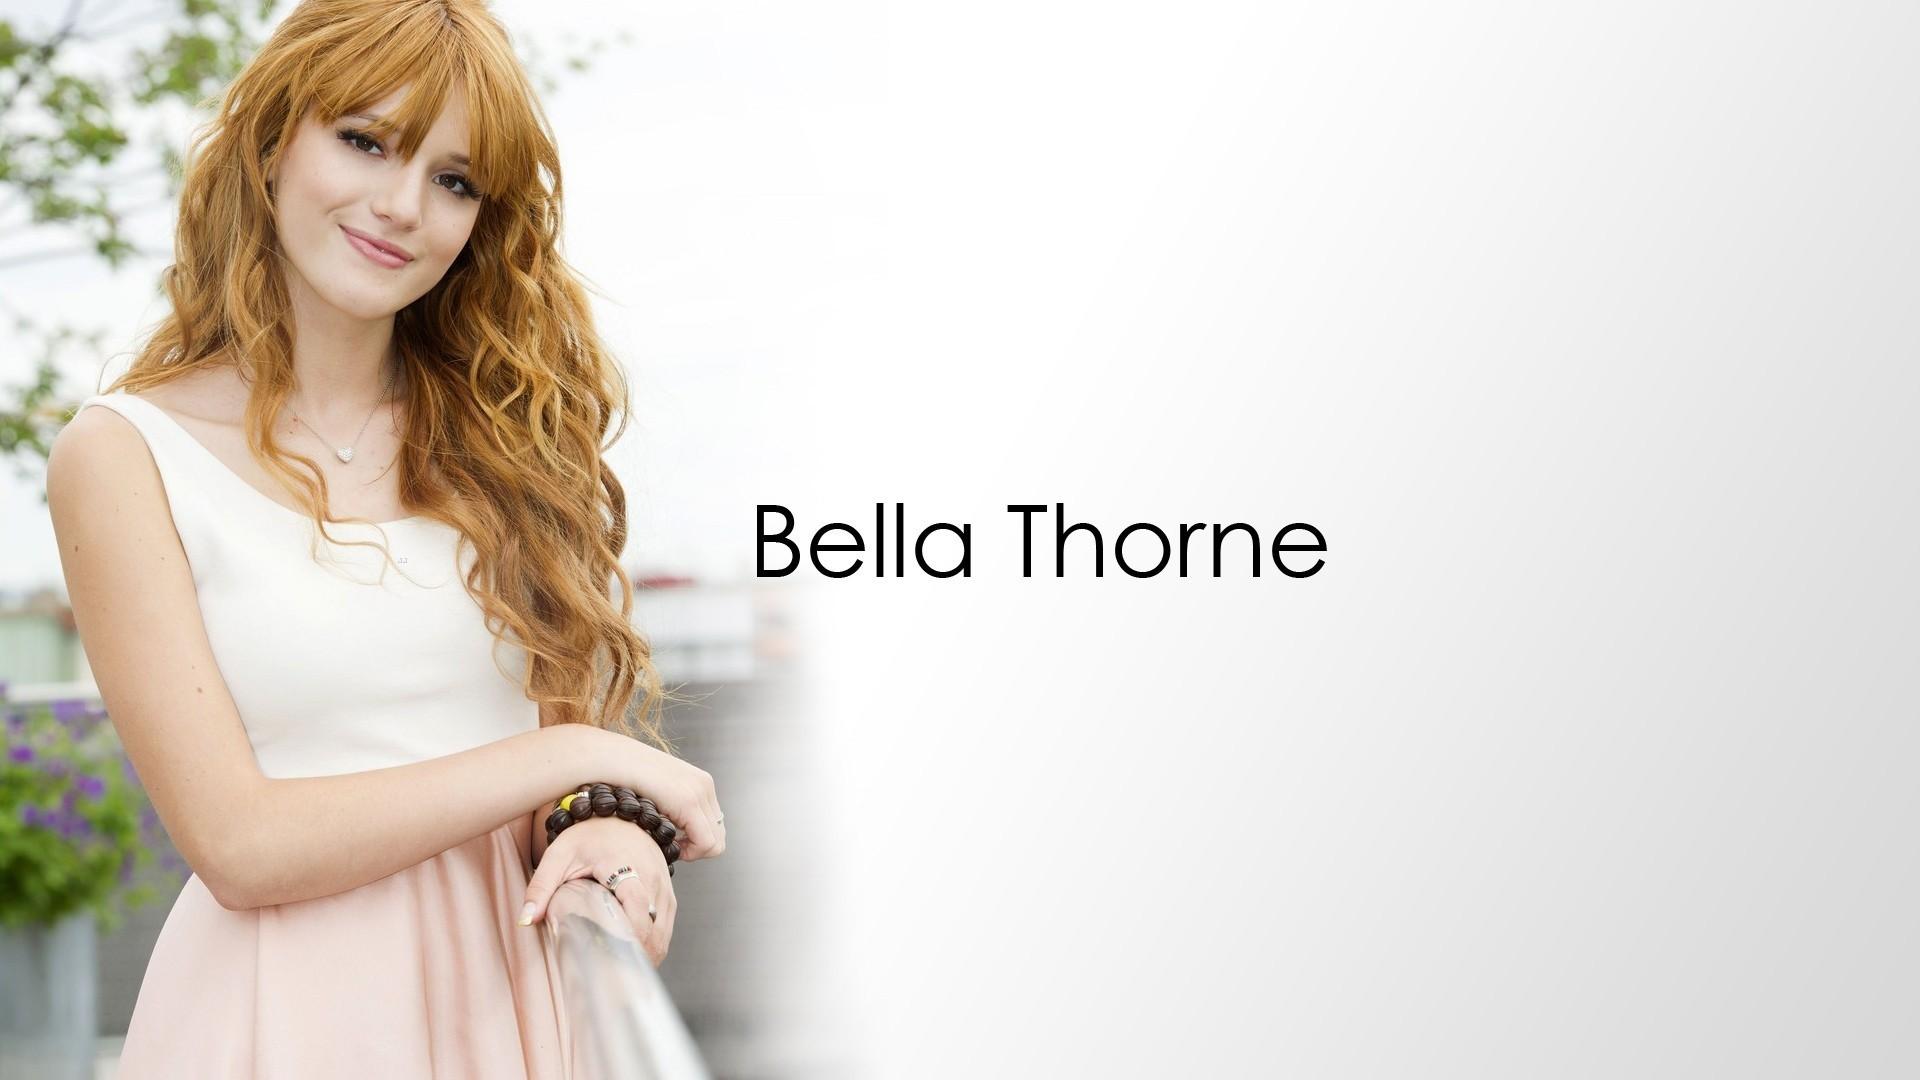 Bella Thorne hd desktop wallpaper